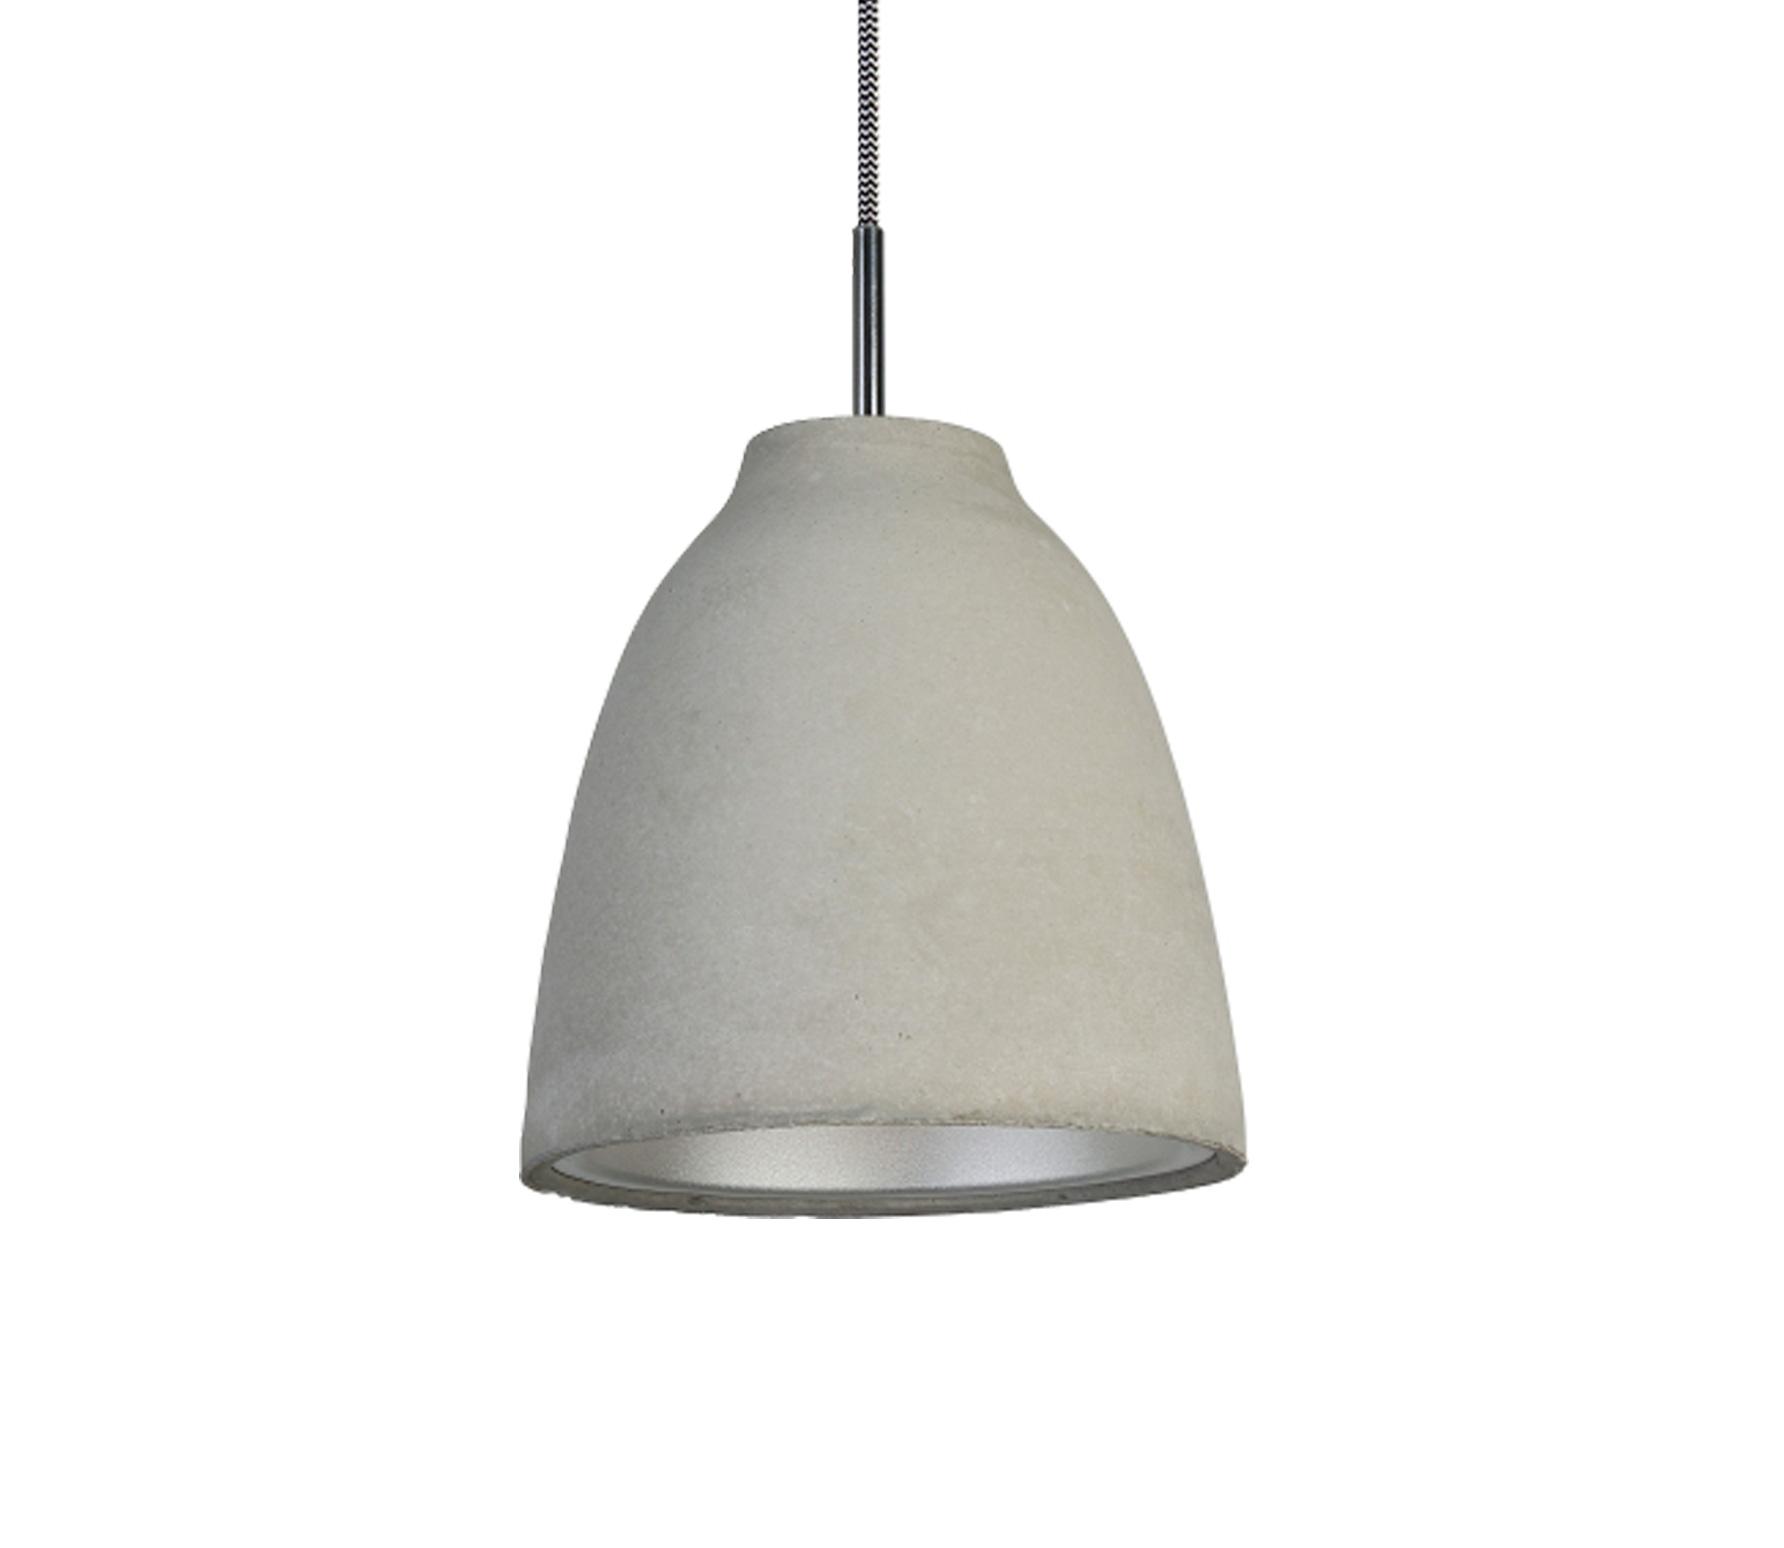 Rostock hanglamp Ø20,5 cm beton grijs